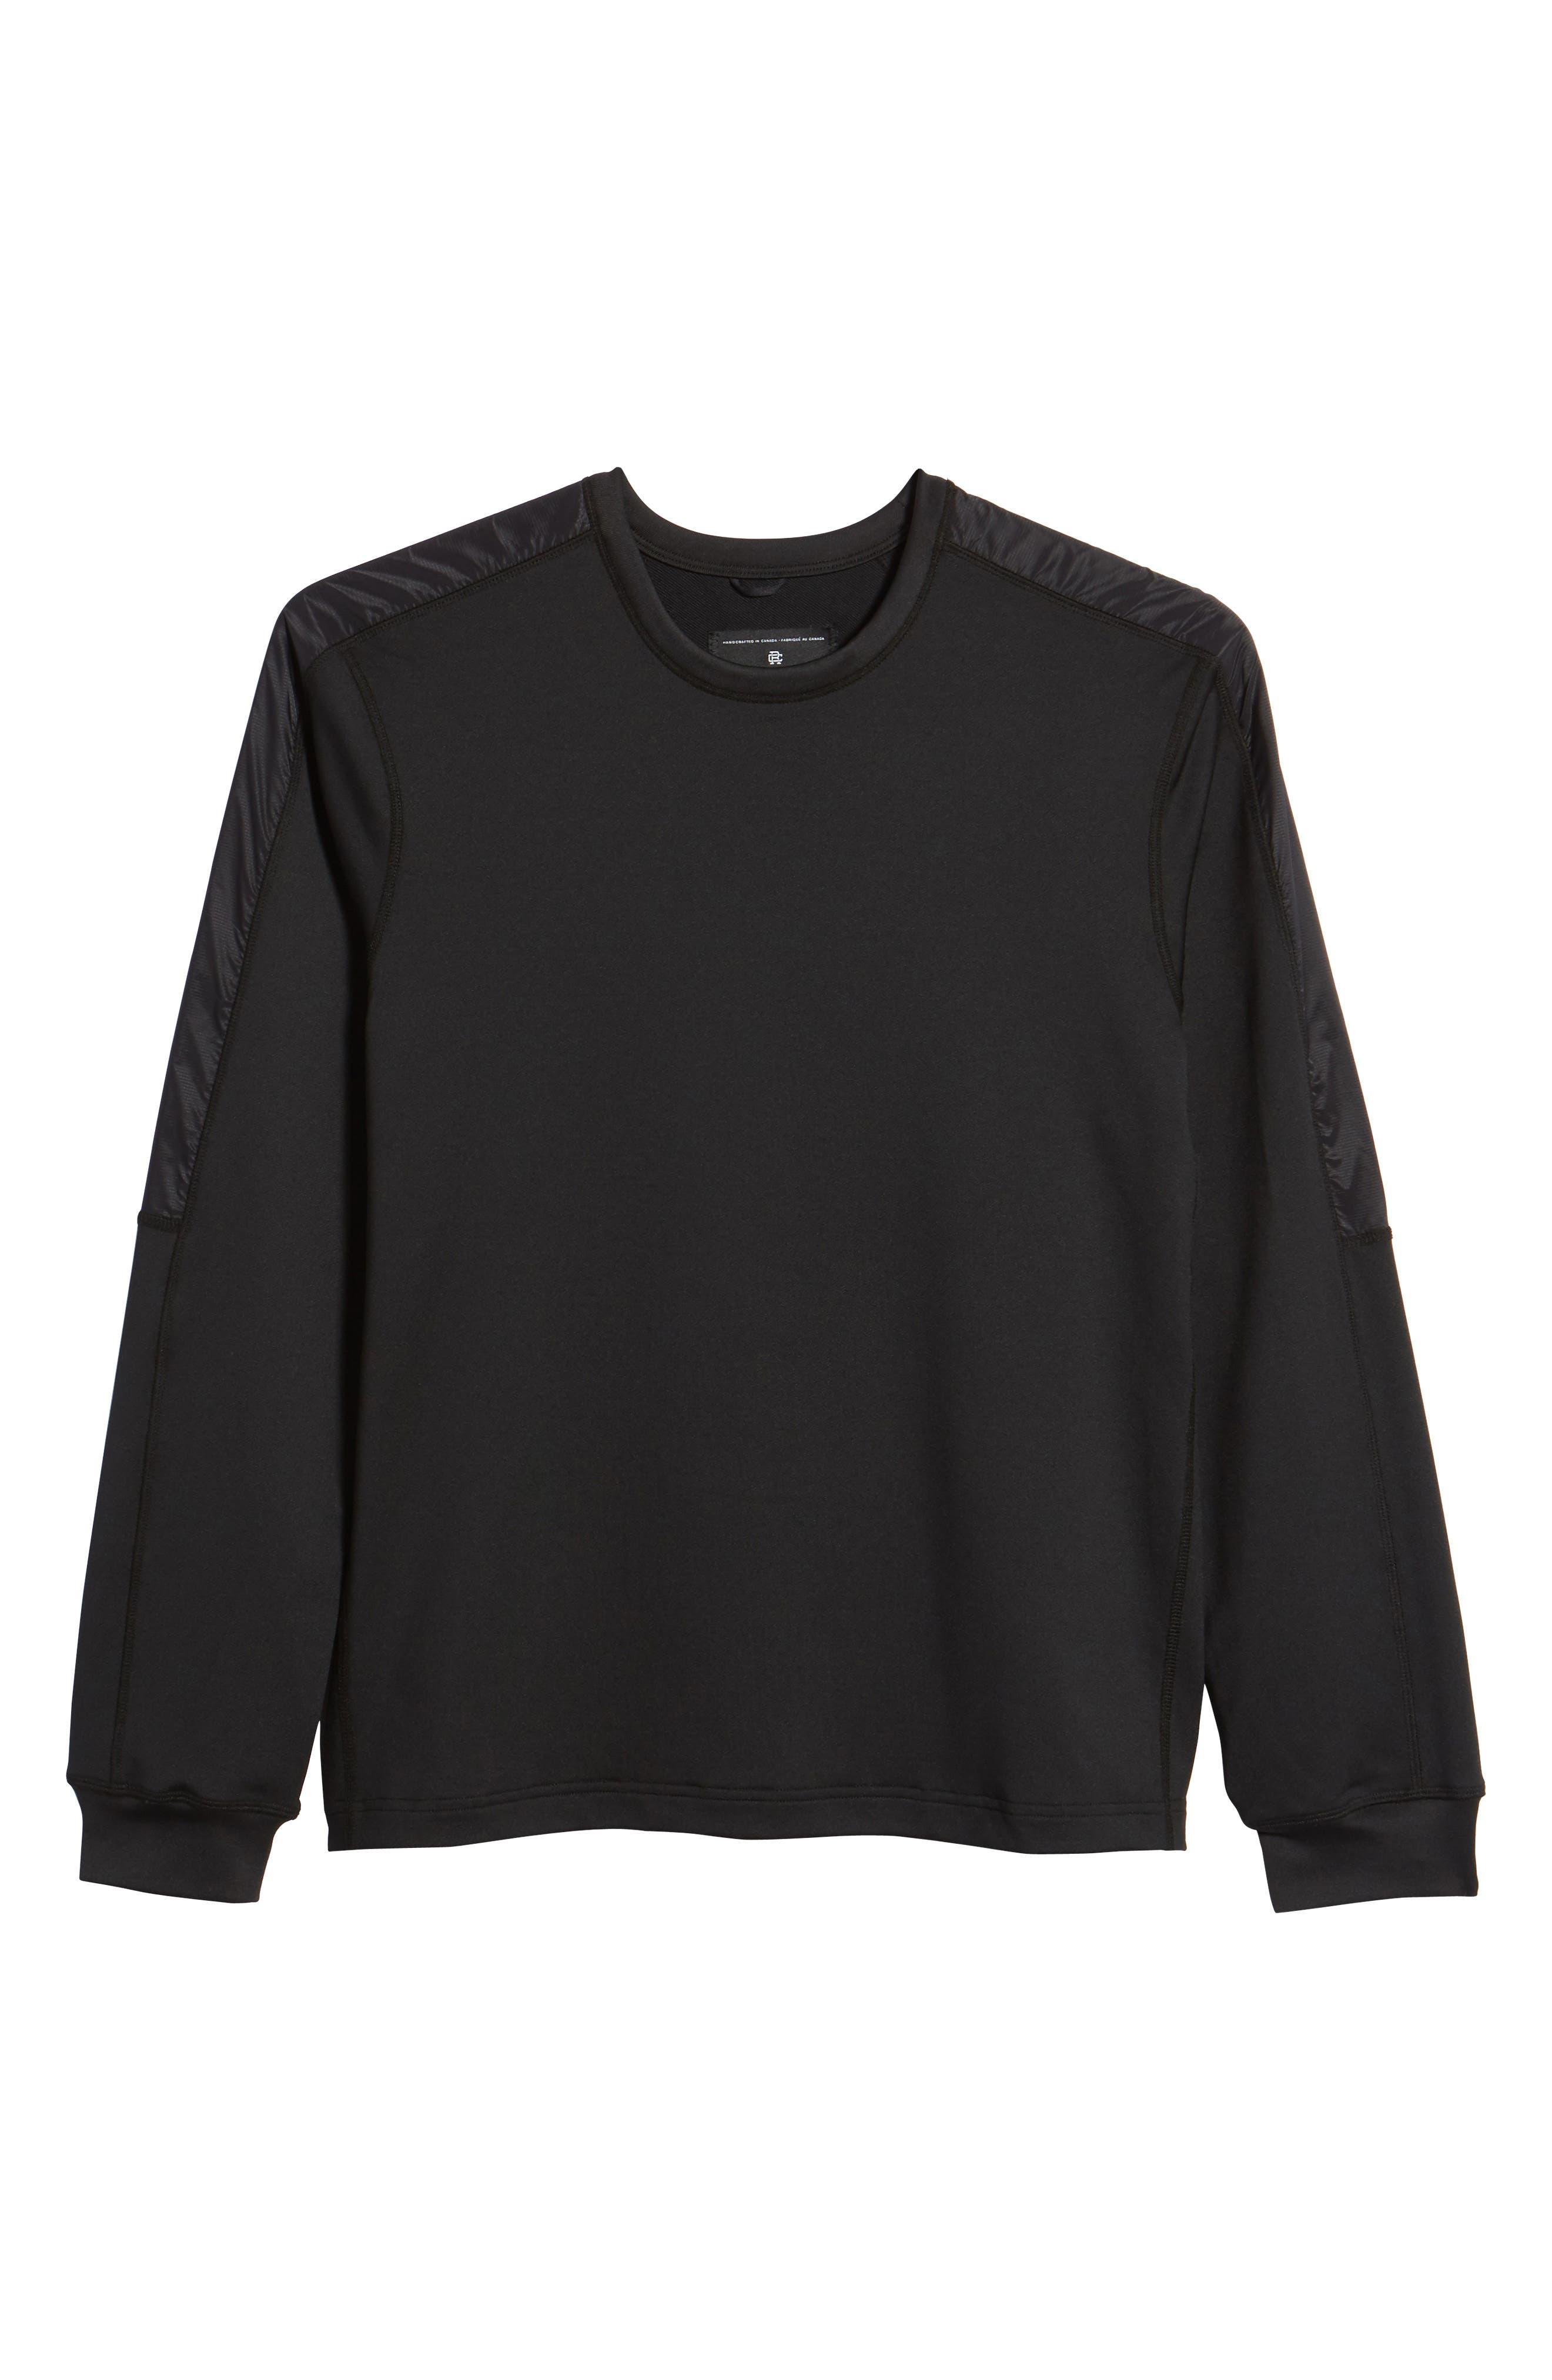 Hybrid Coolmax Crewneck Shirt,                             Alternate thumbnail 6, color,                             Black